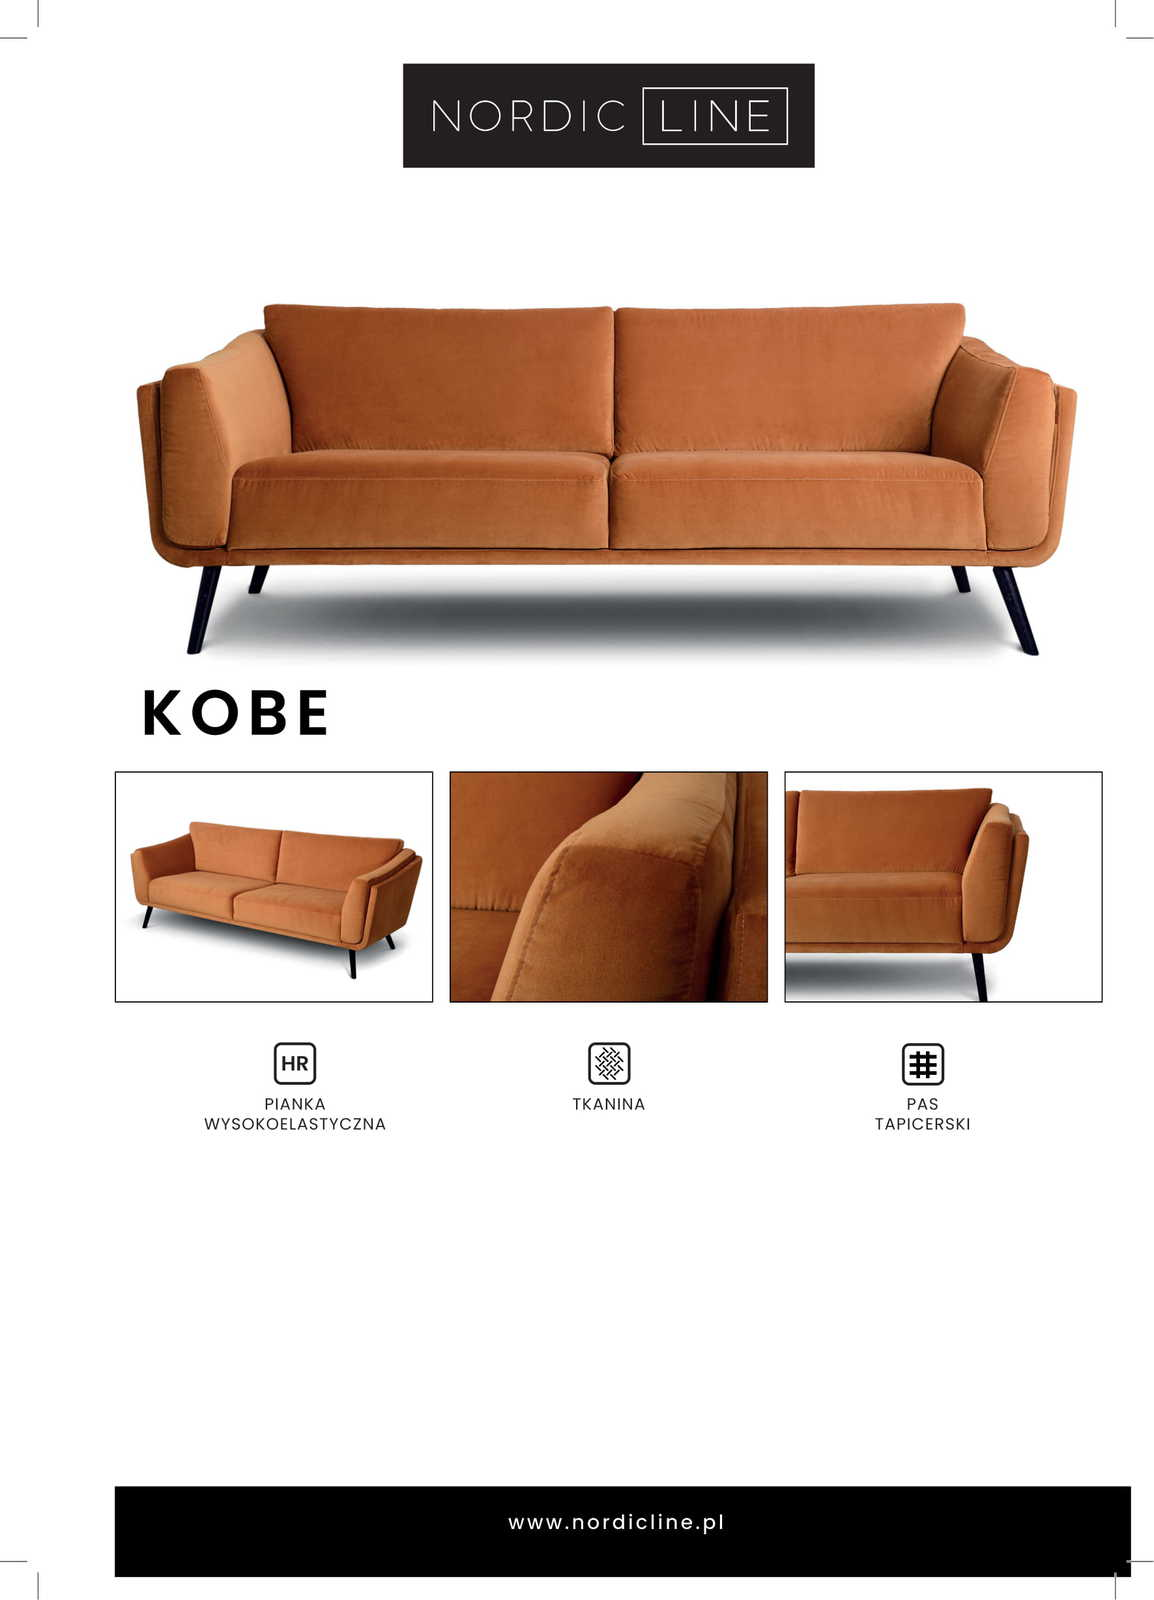 Kobe(krzywe) (3) 1